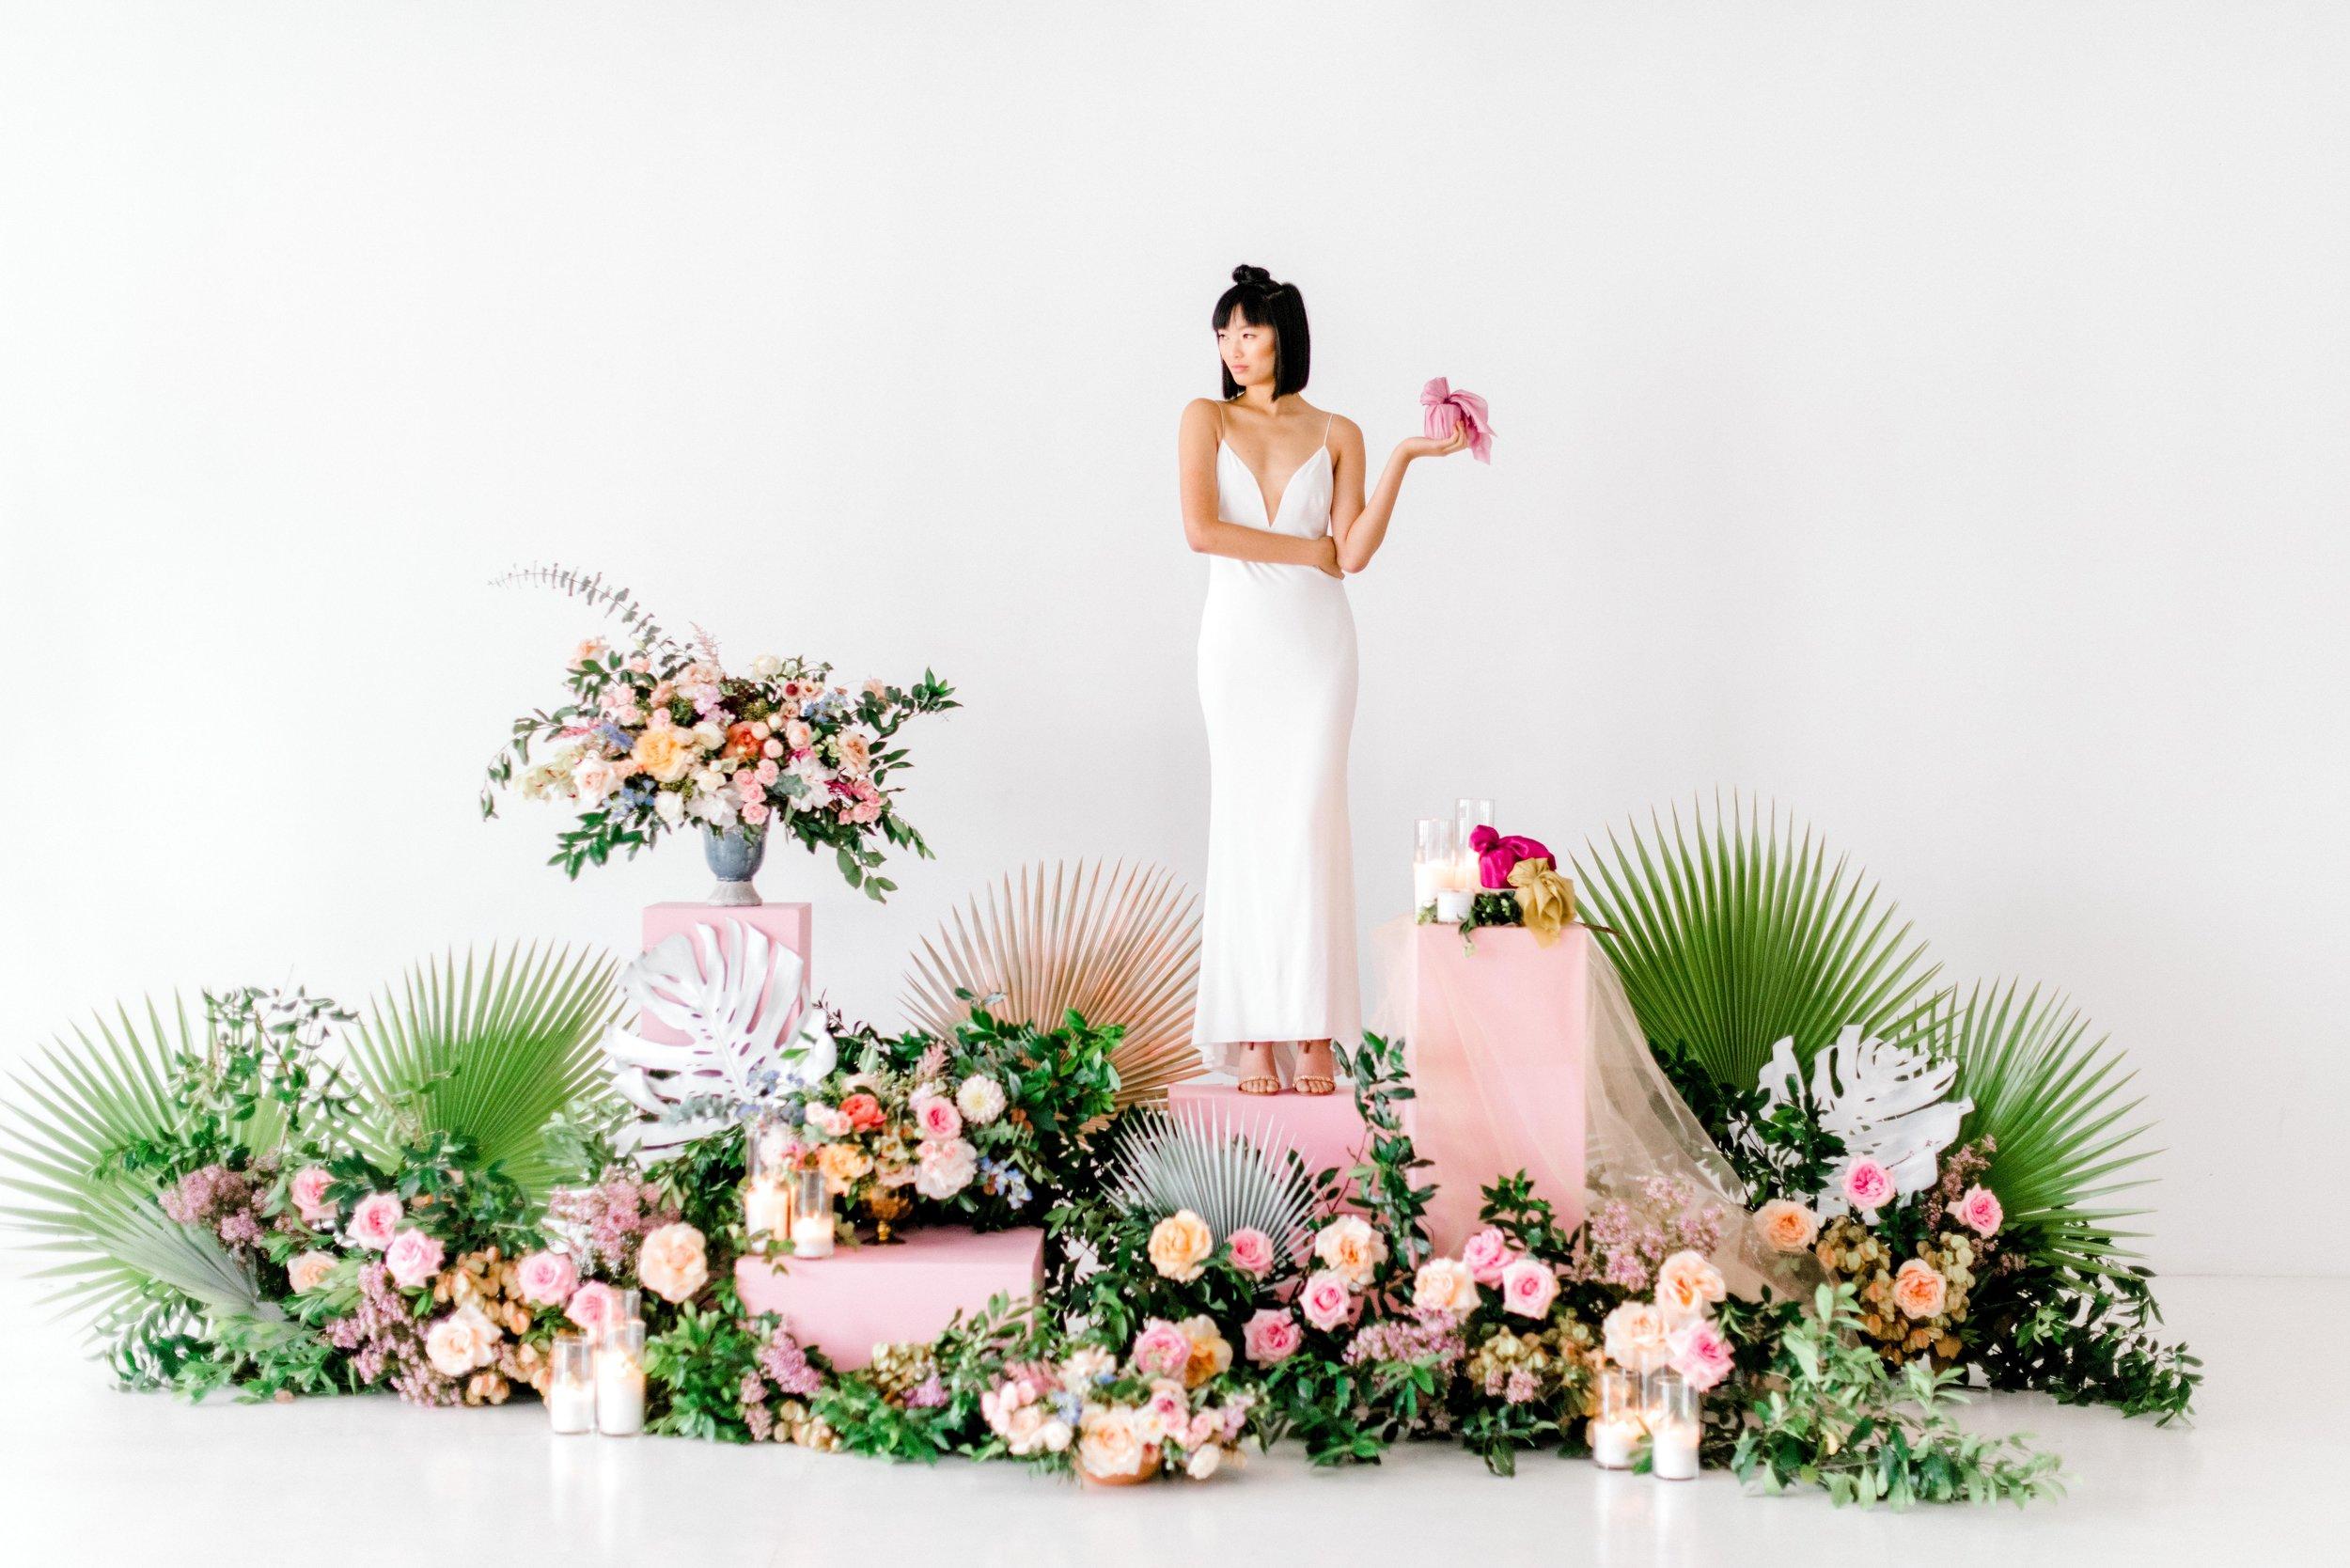 Houston-Wedding-Photographer-Editorial-Fine-Art-Film-Destination-Dallas-Texas-Mibellarosa-Josh-Dana-Fernandez-Photography-1.jpg